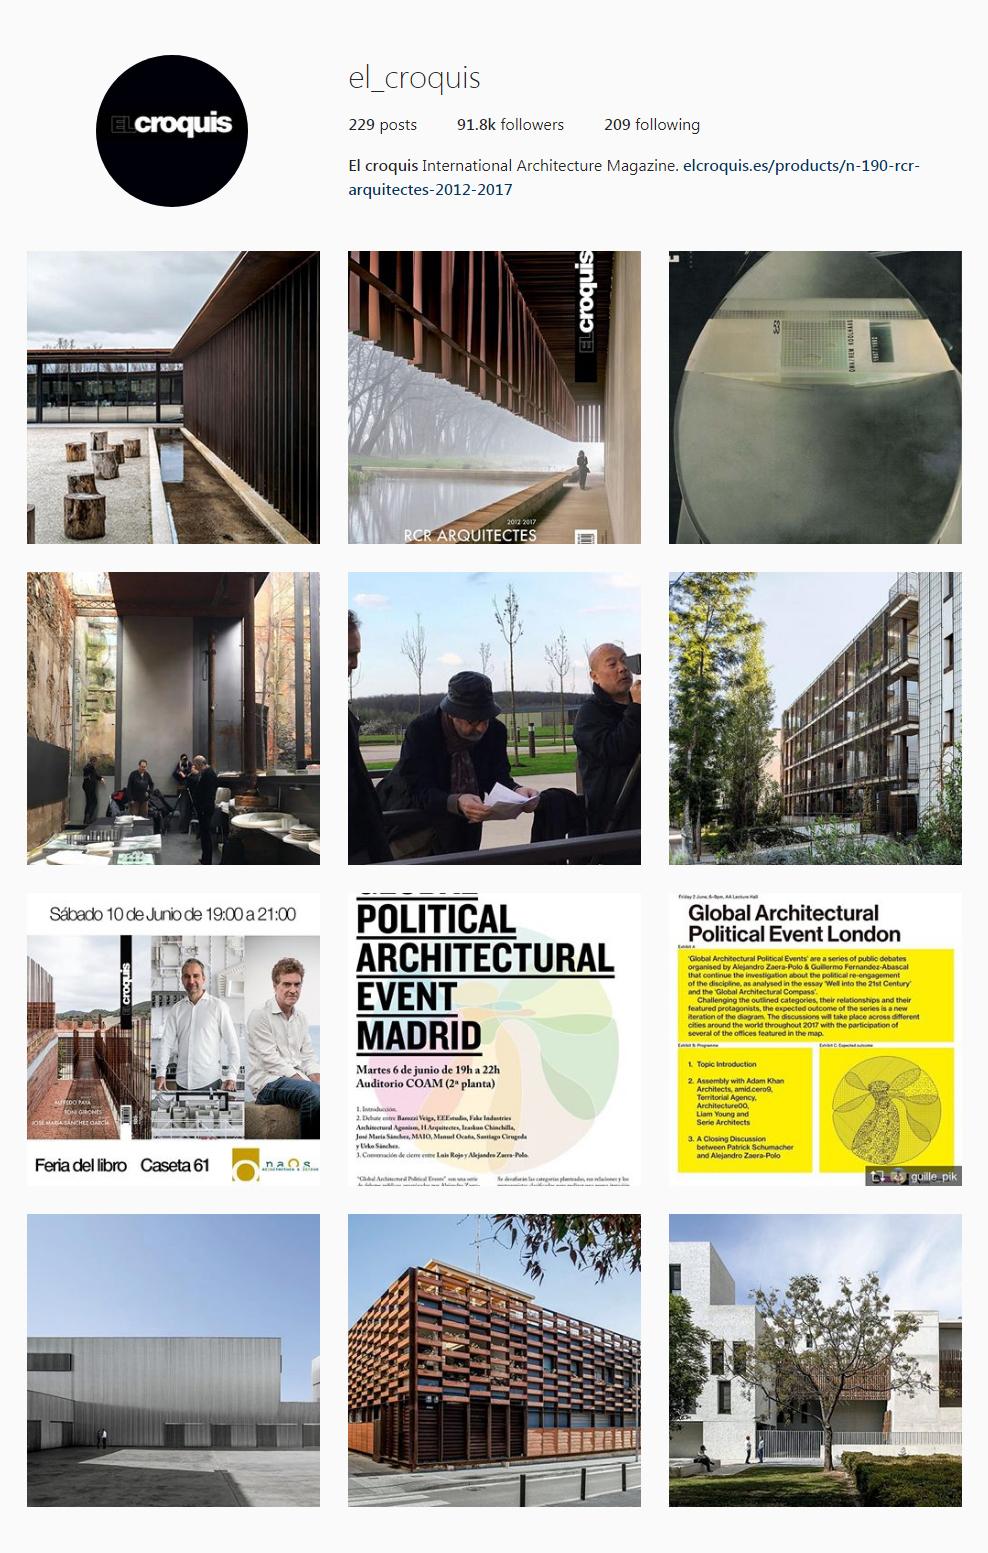 Best Architectural Instagram Feeds of 2017 - el_croquis